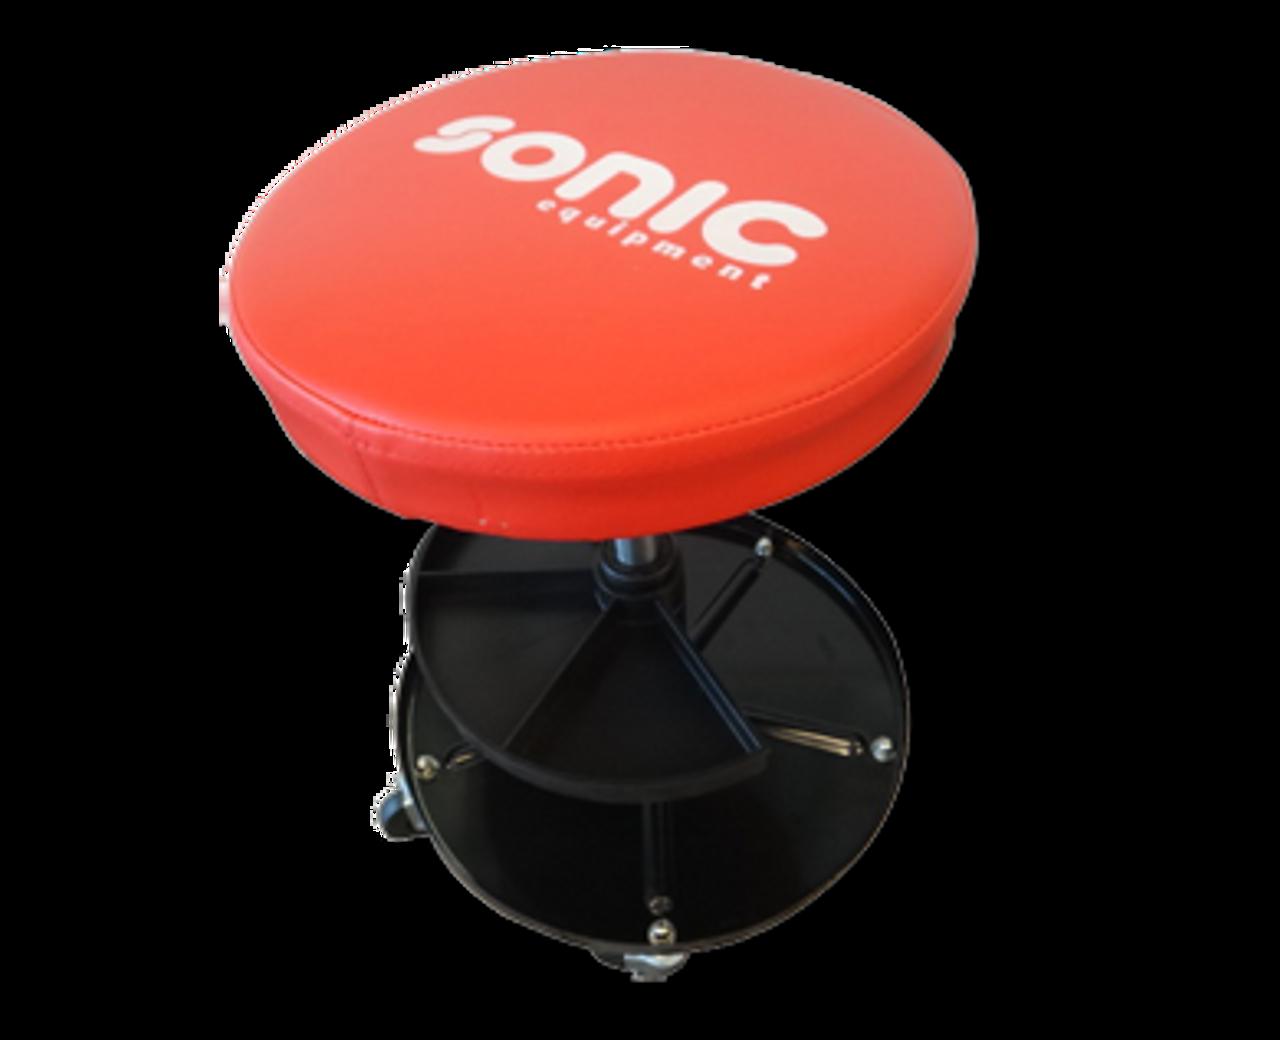 Superb Adjustable Roller Seat Pneumatic 5 Wheels Ibusinesslaw Wood Chair Design Ideas Ibusinesslaworg